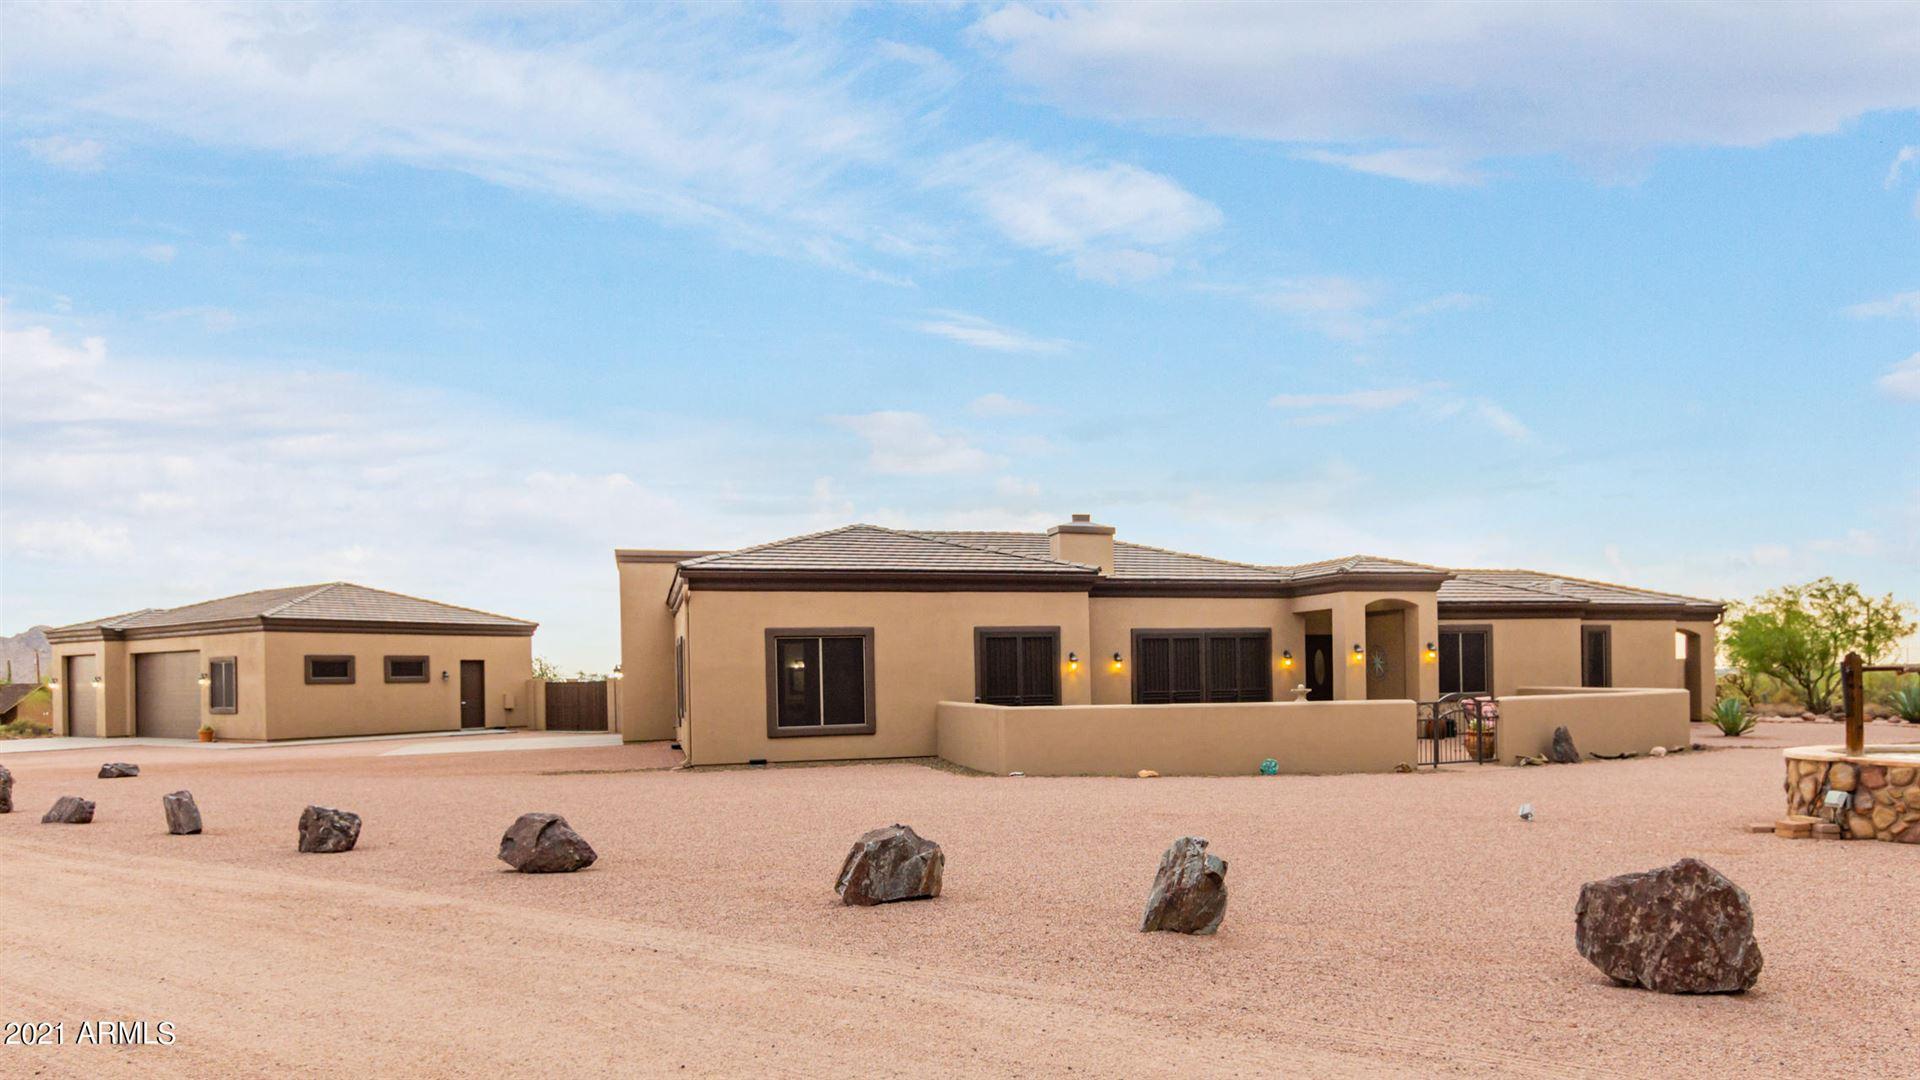 Photo of 6383 E 18TH Avenue, Apache Junction, AZ 85119 (MLS # 6265729)